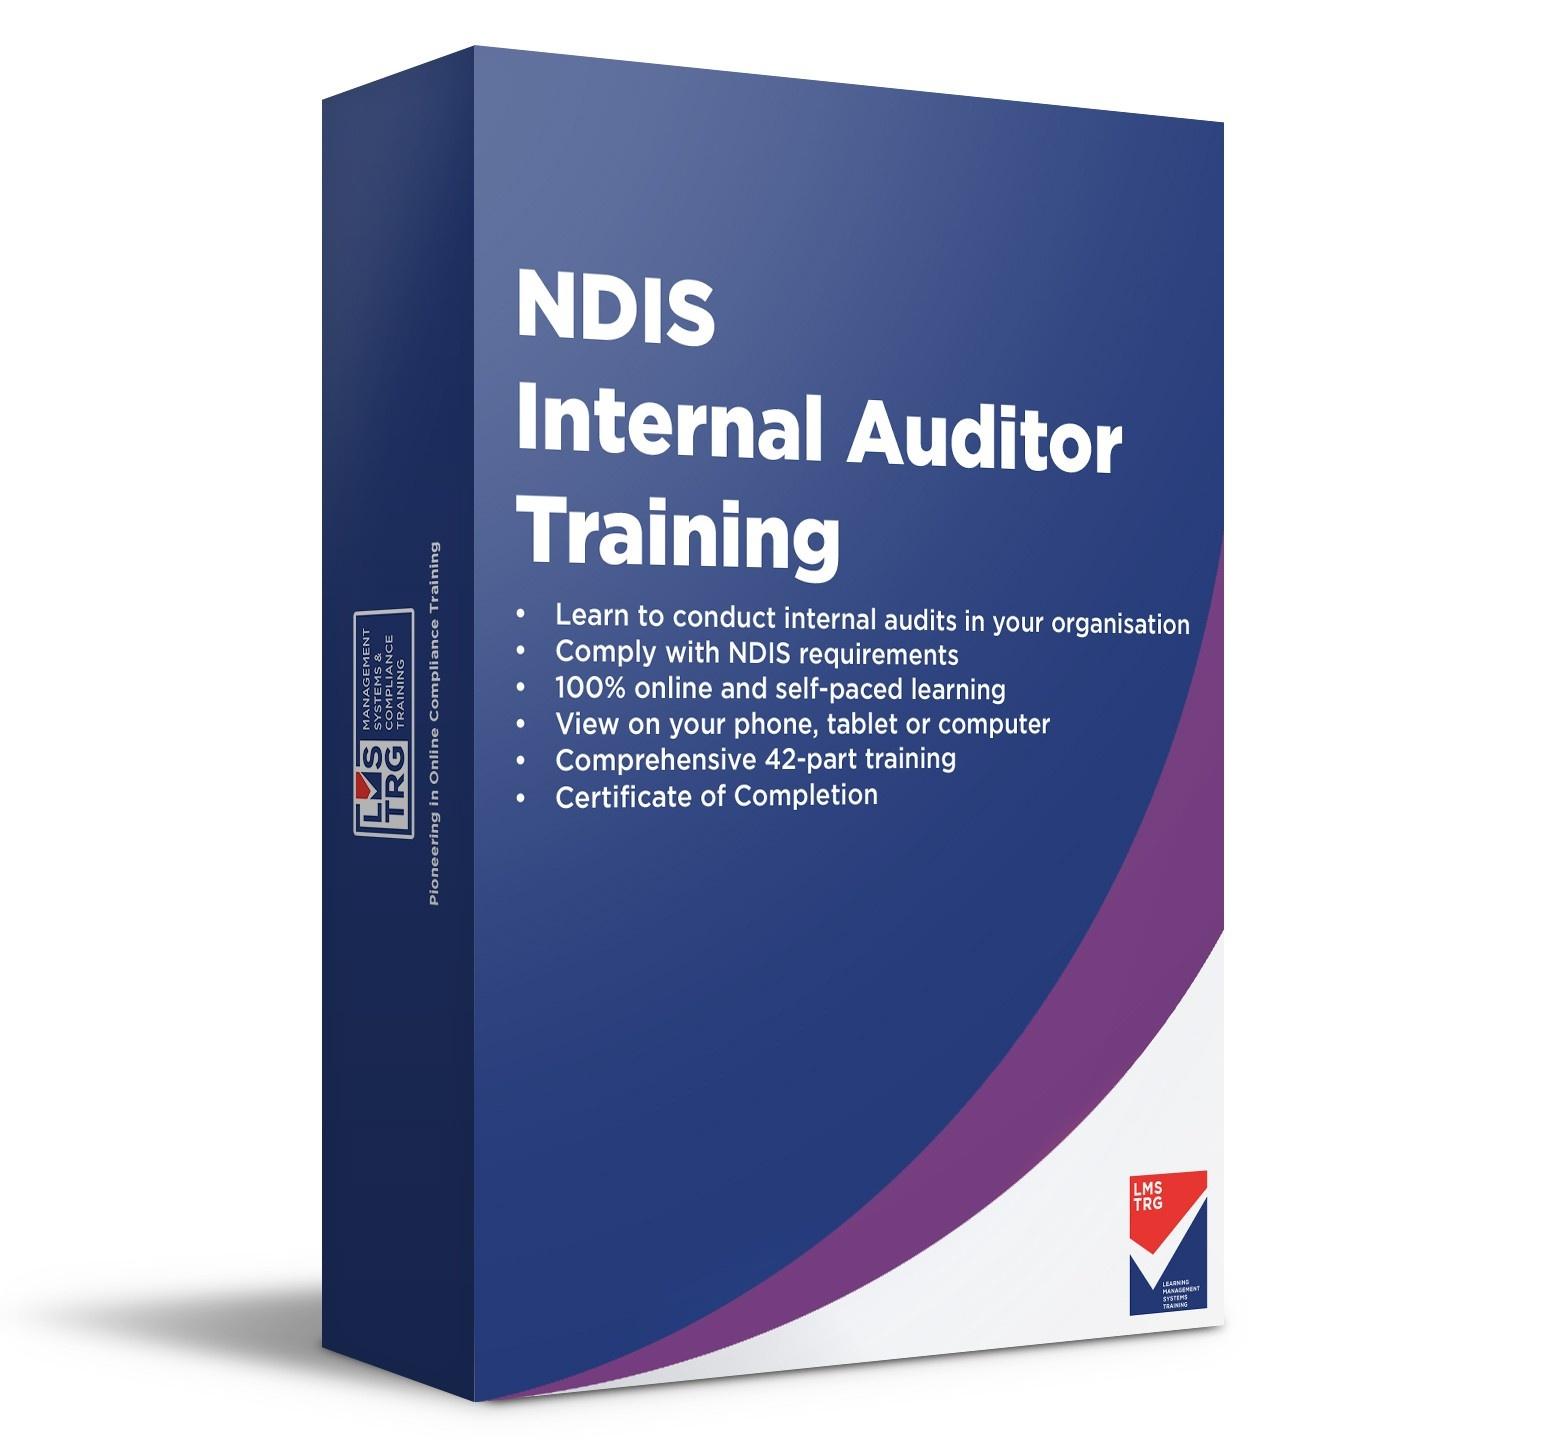 NDIS Online Internal Auditor Training